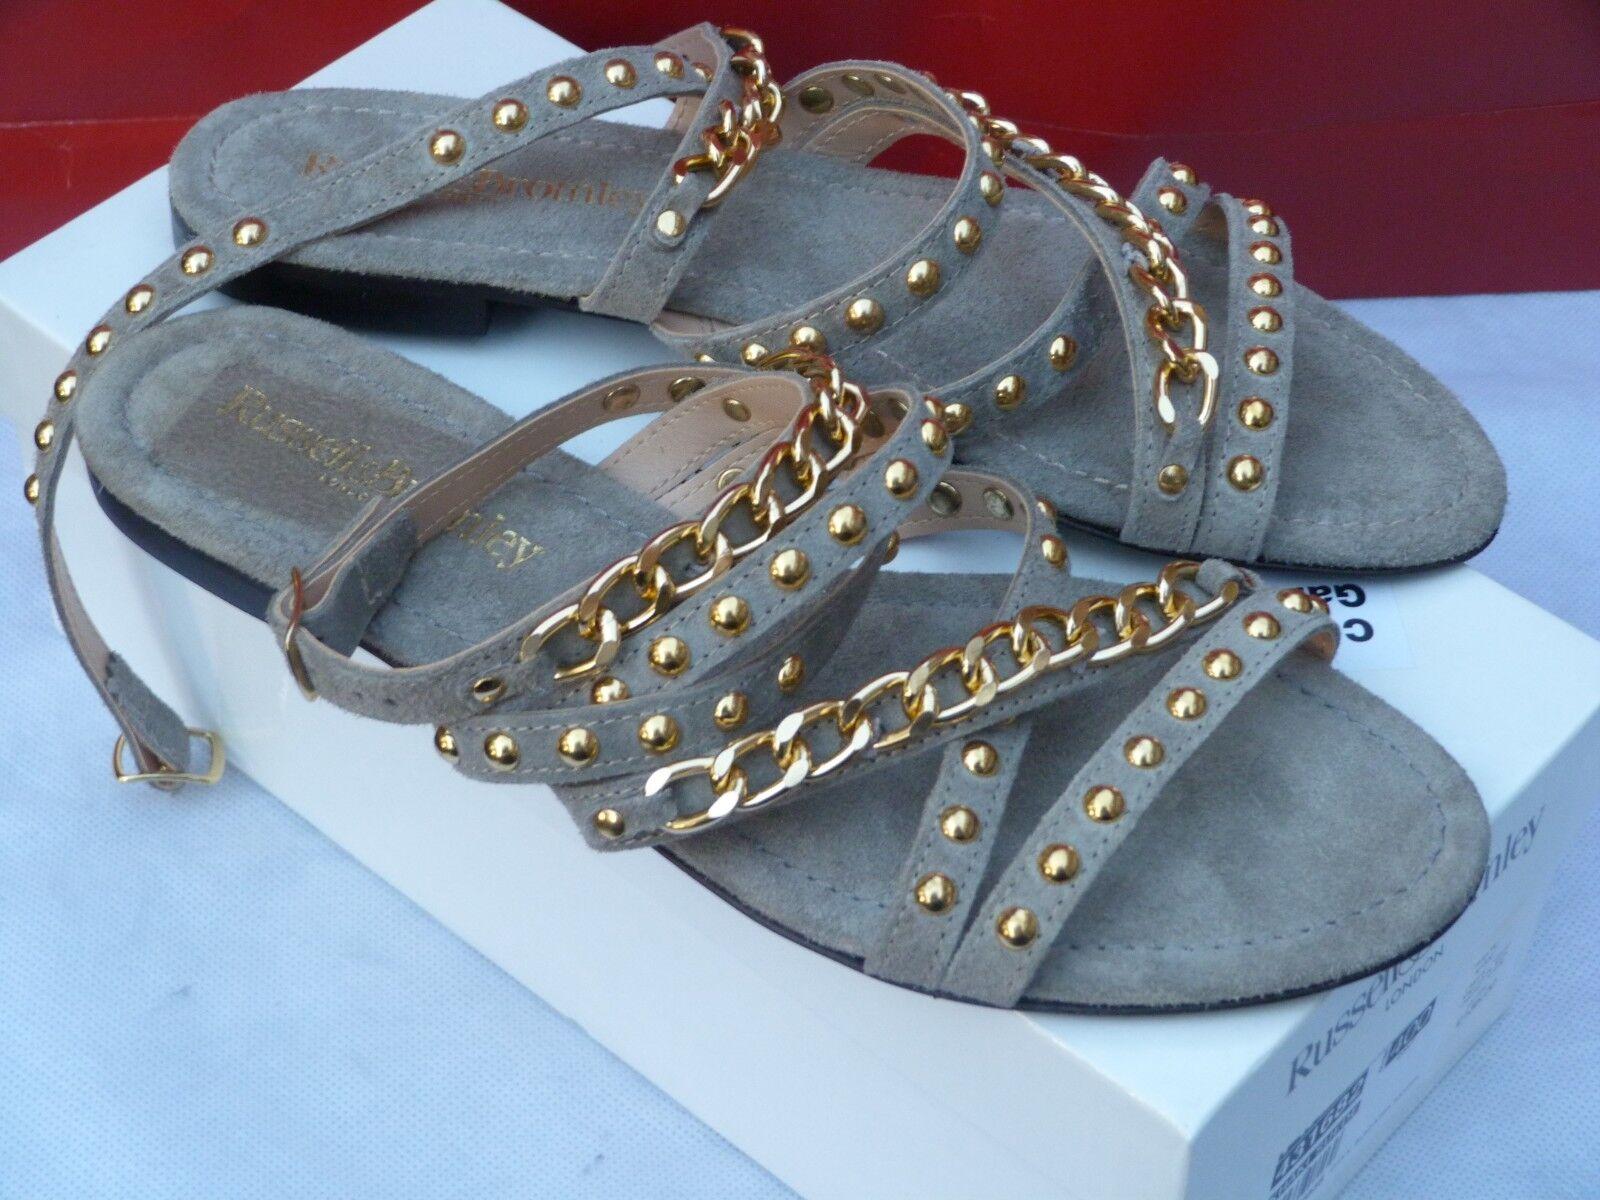 Russellbromley Femmes Sandales Taille 7 7 7 Mini Gladiateurs NEUF sandalios FEMININOS USA 14b289